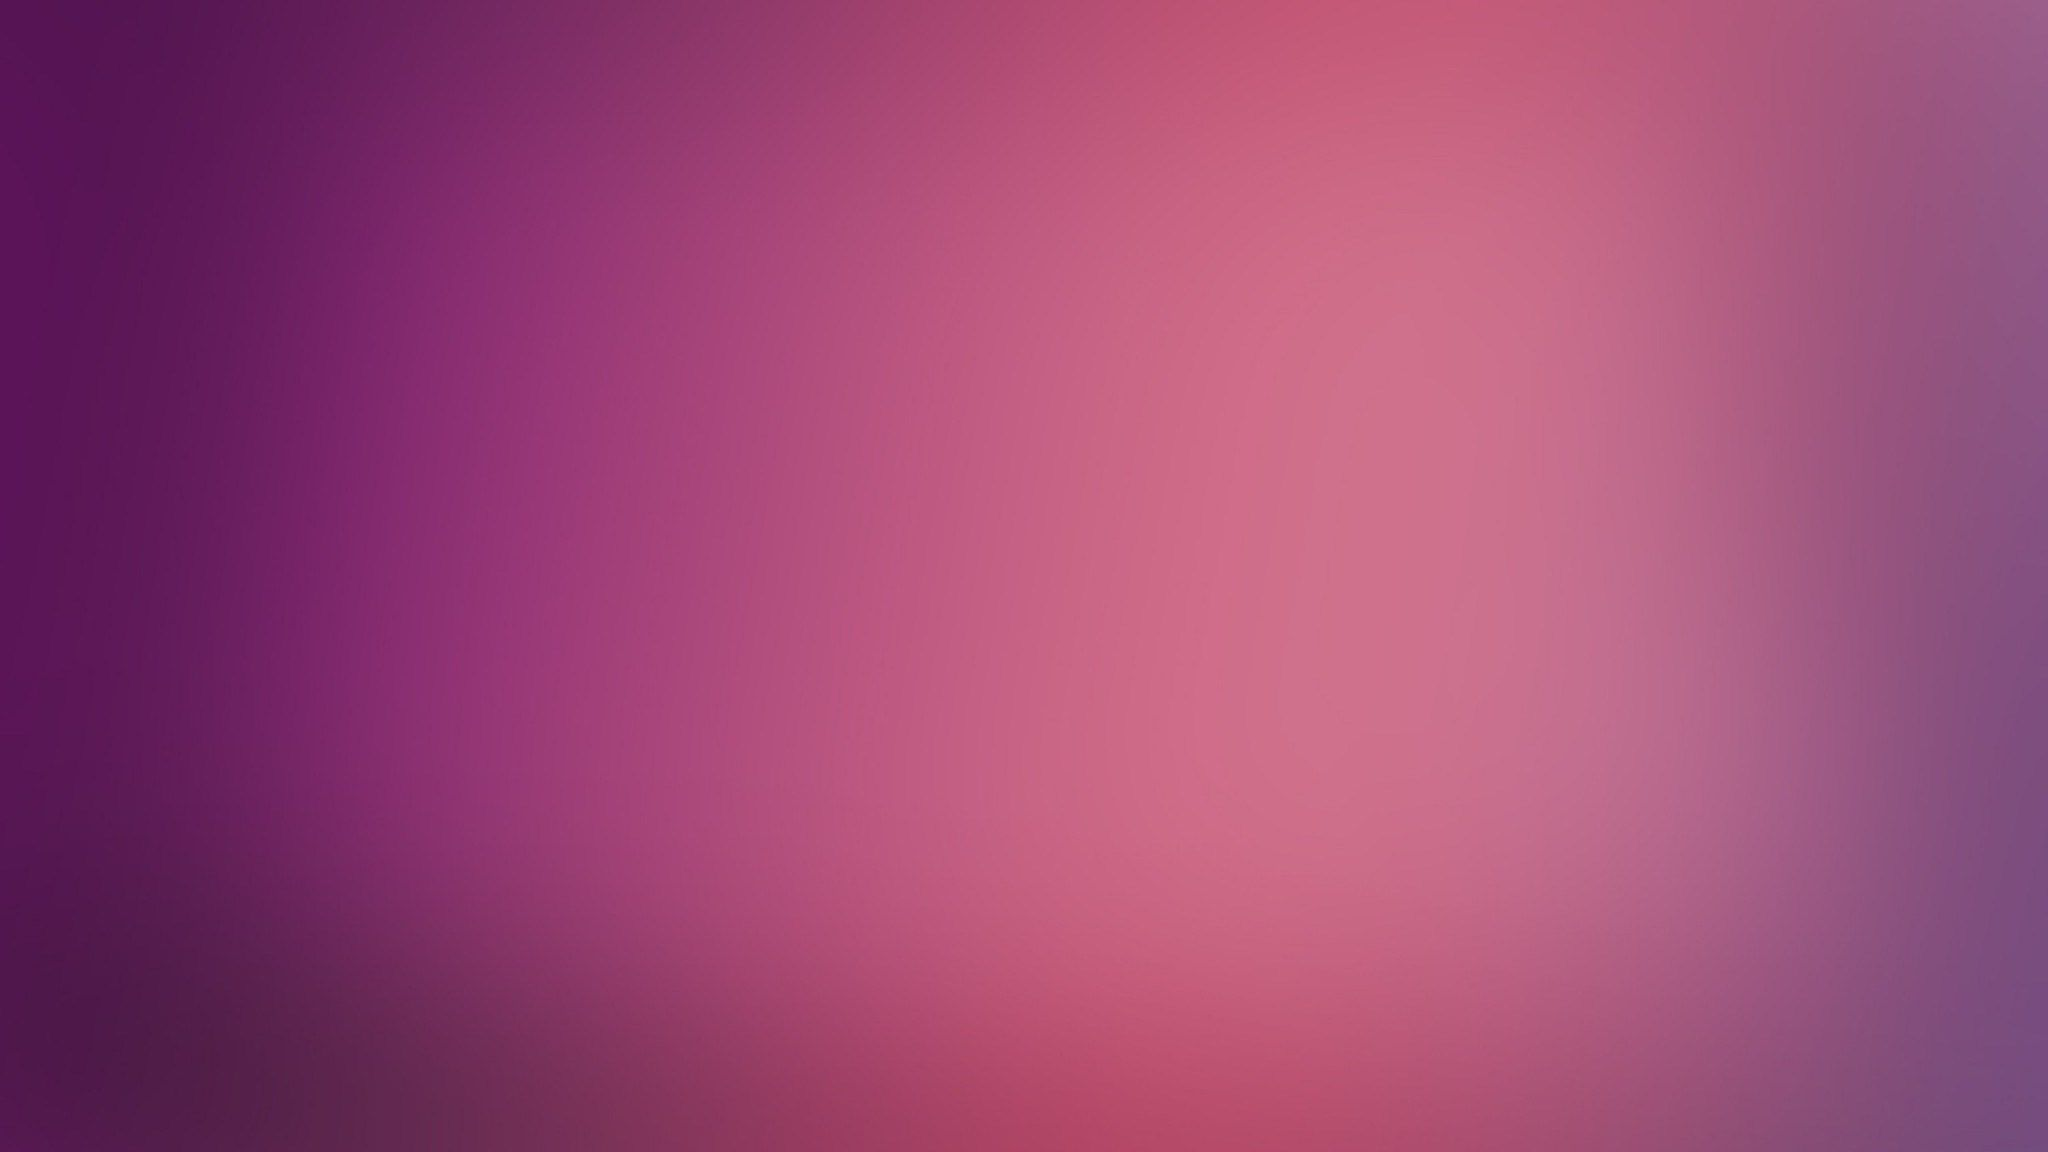 Solid Color Hd Wallpapers For Desktop